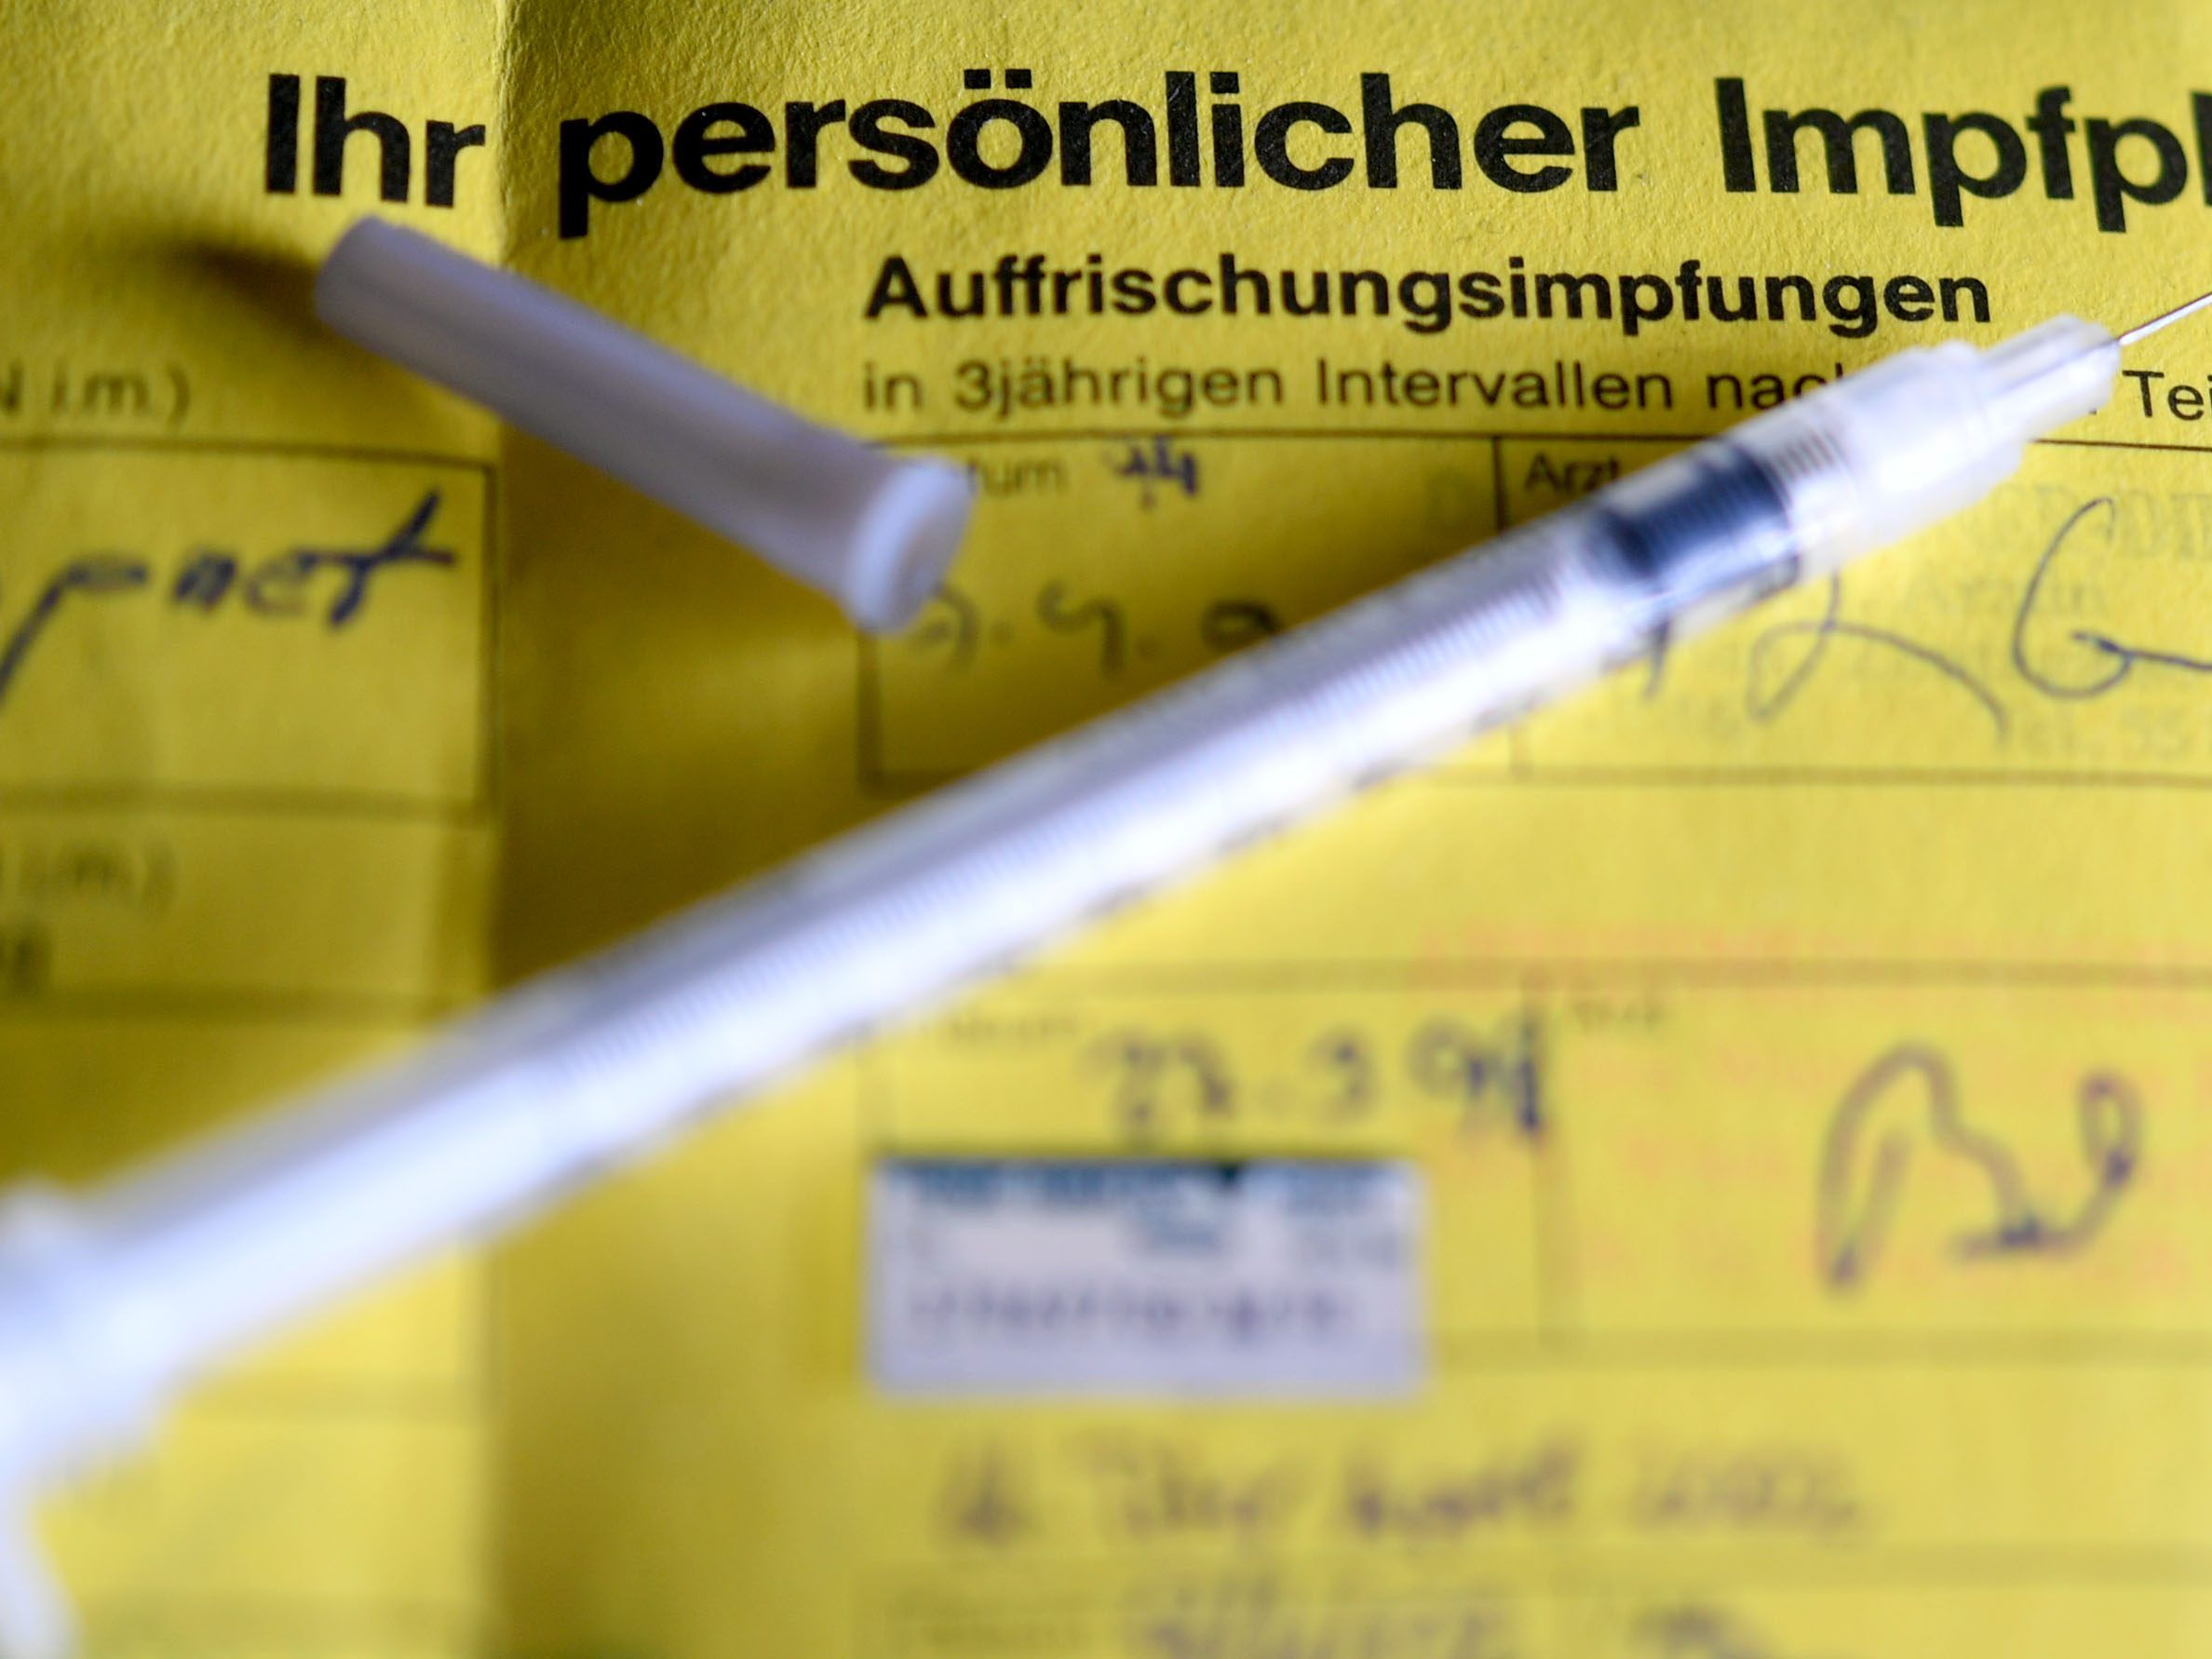 Hpv impfung verboten, HPV szemölcs spontán gyogyulása kill papillomavirus